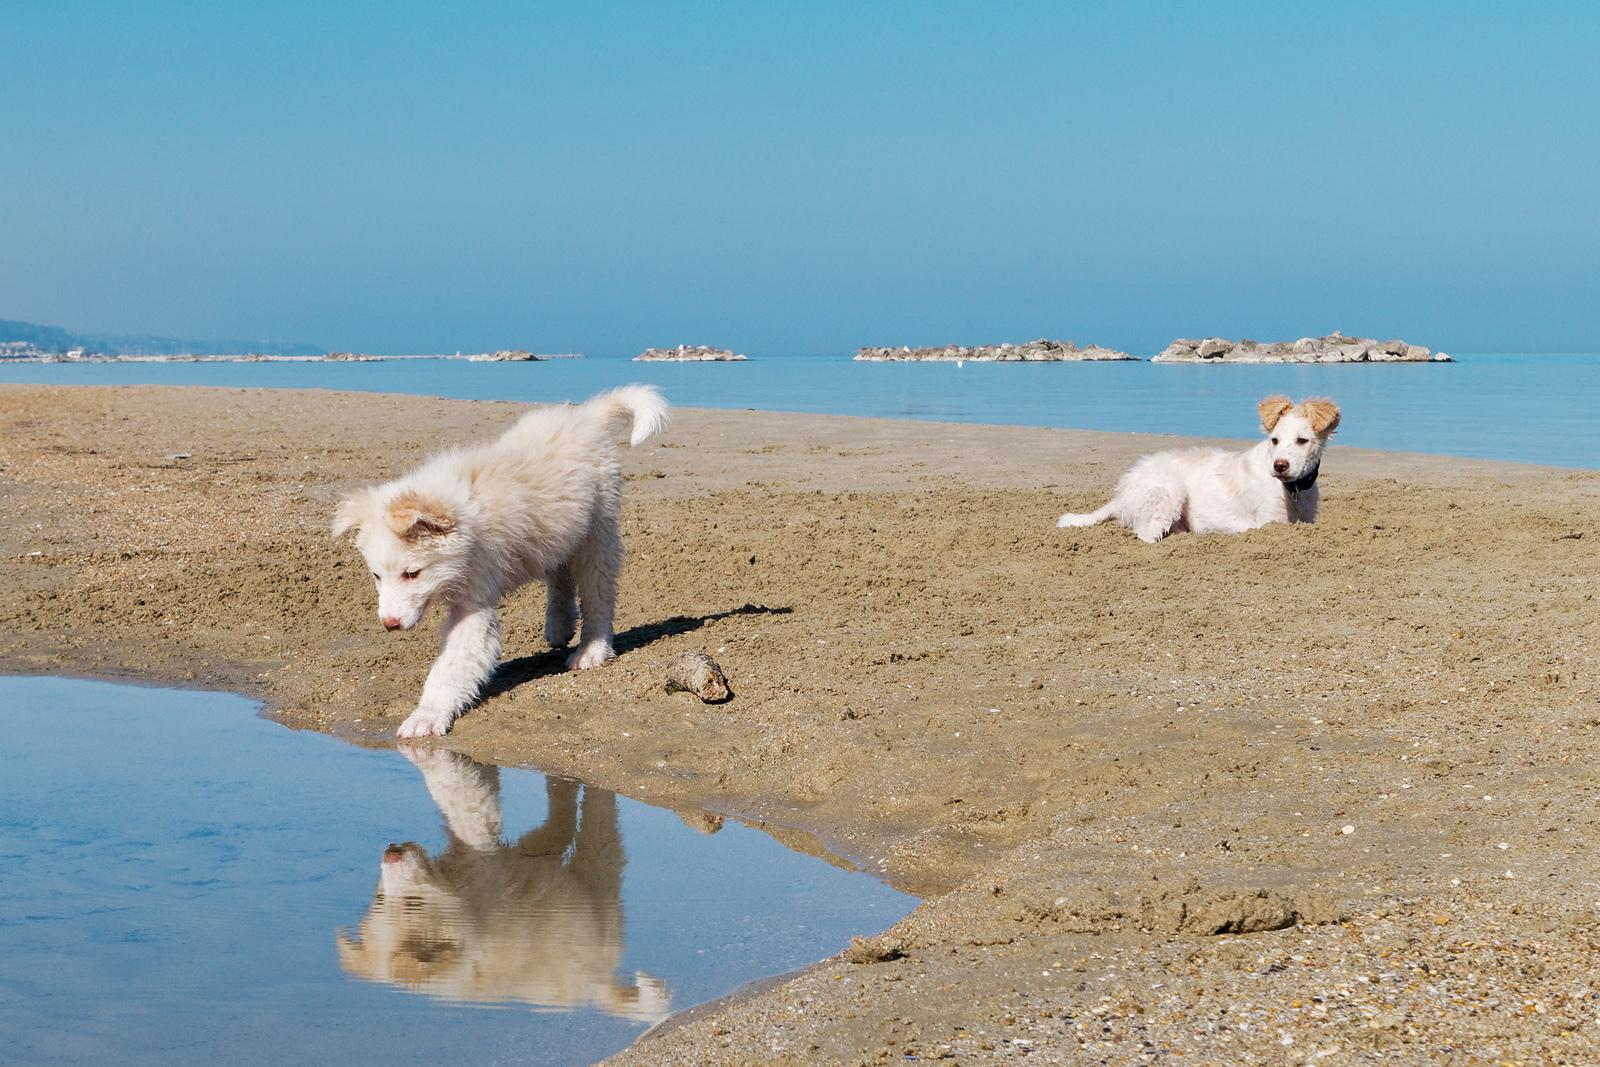 Mirror on the Beach